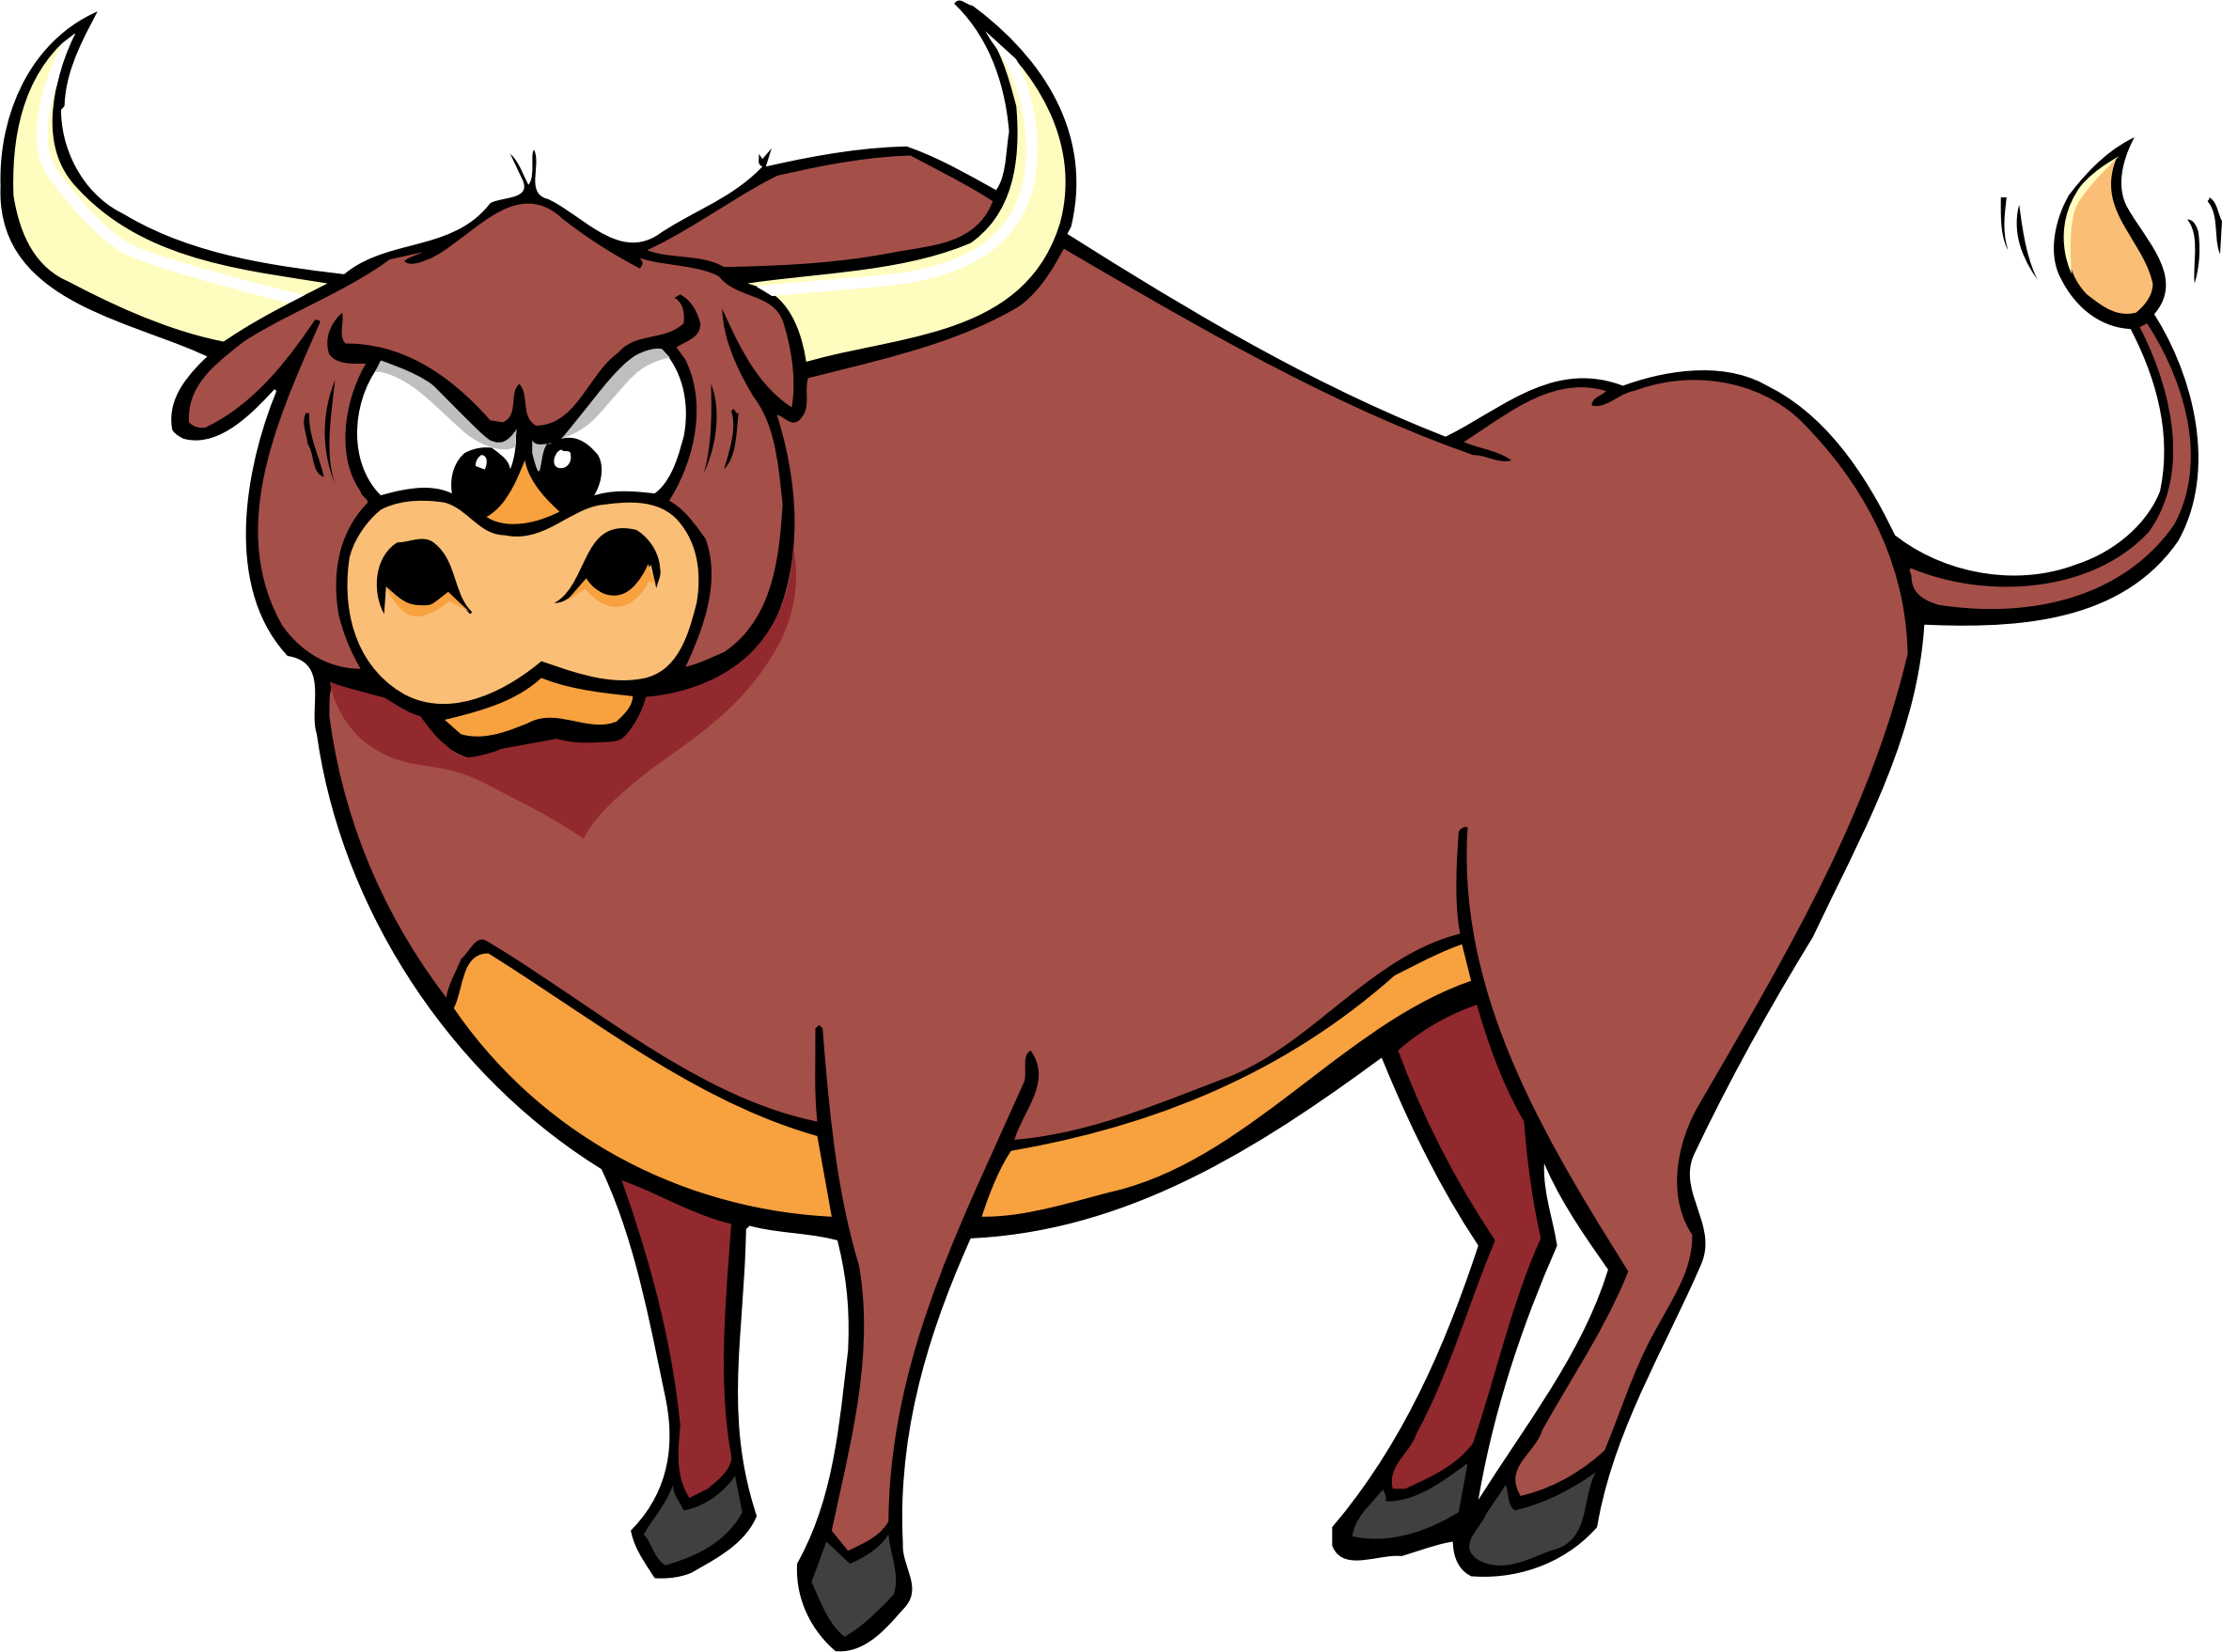 Goat clipart horns. Bull big image png